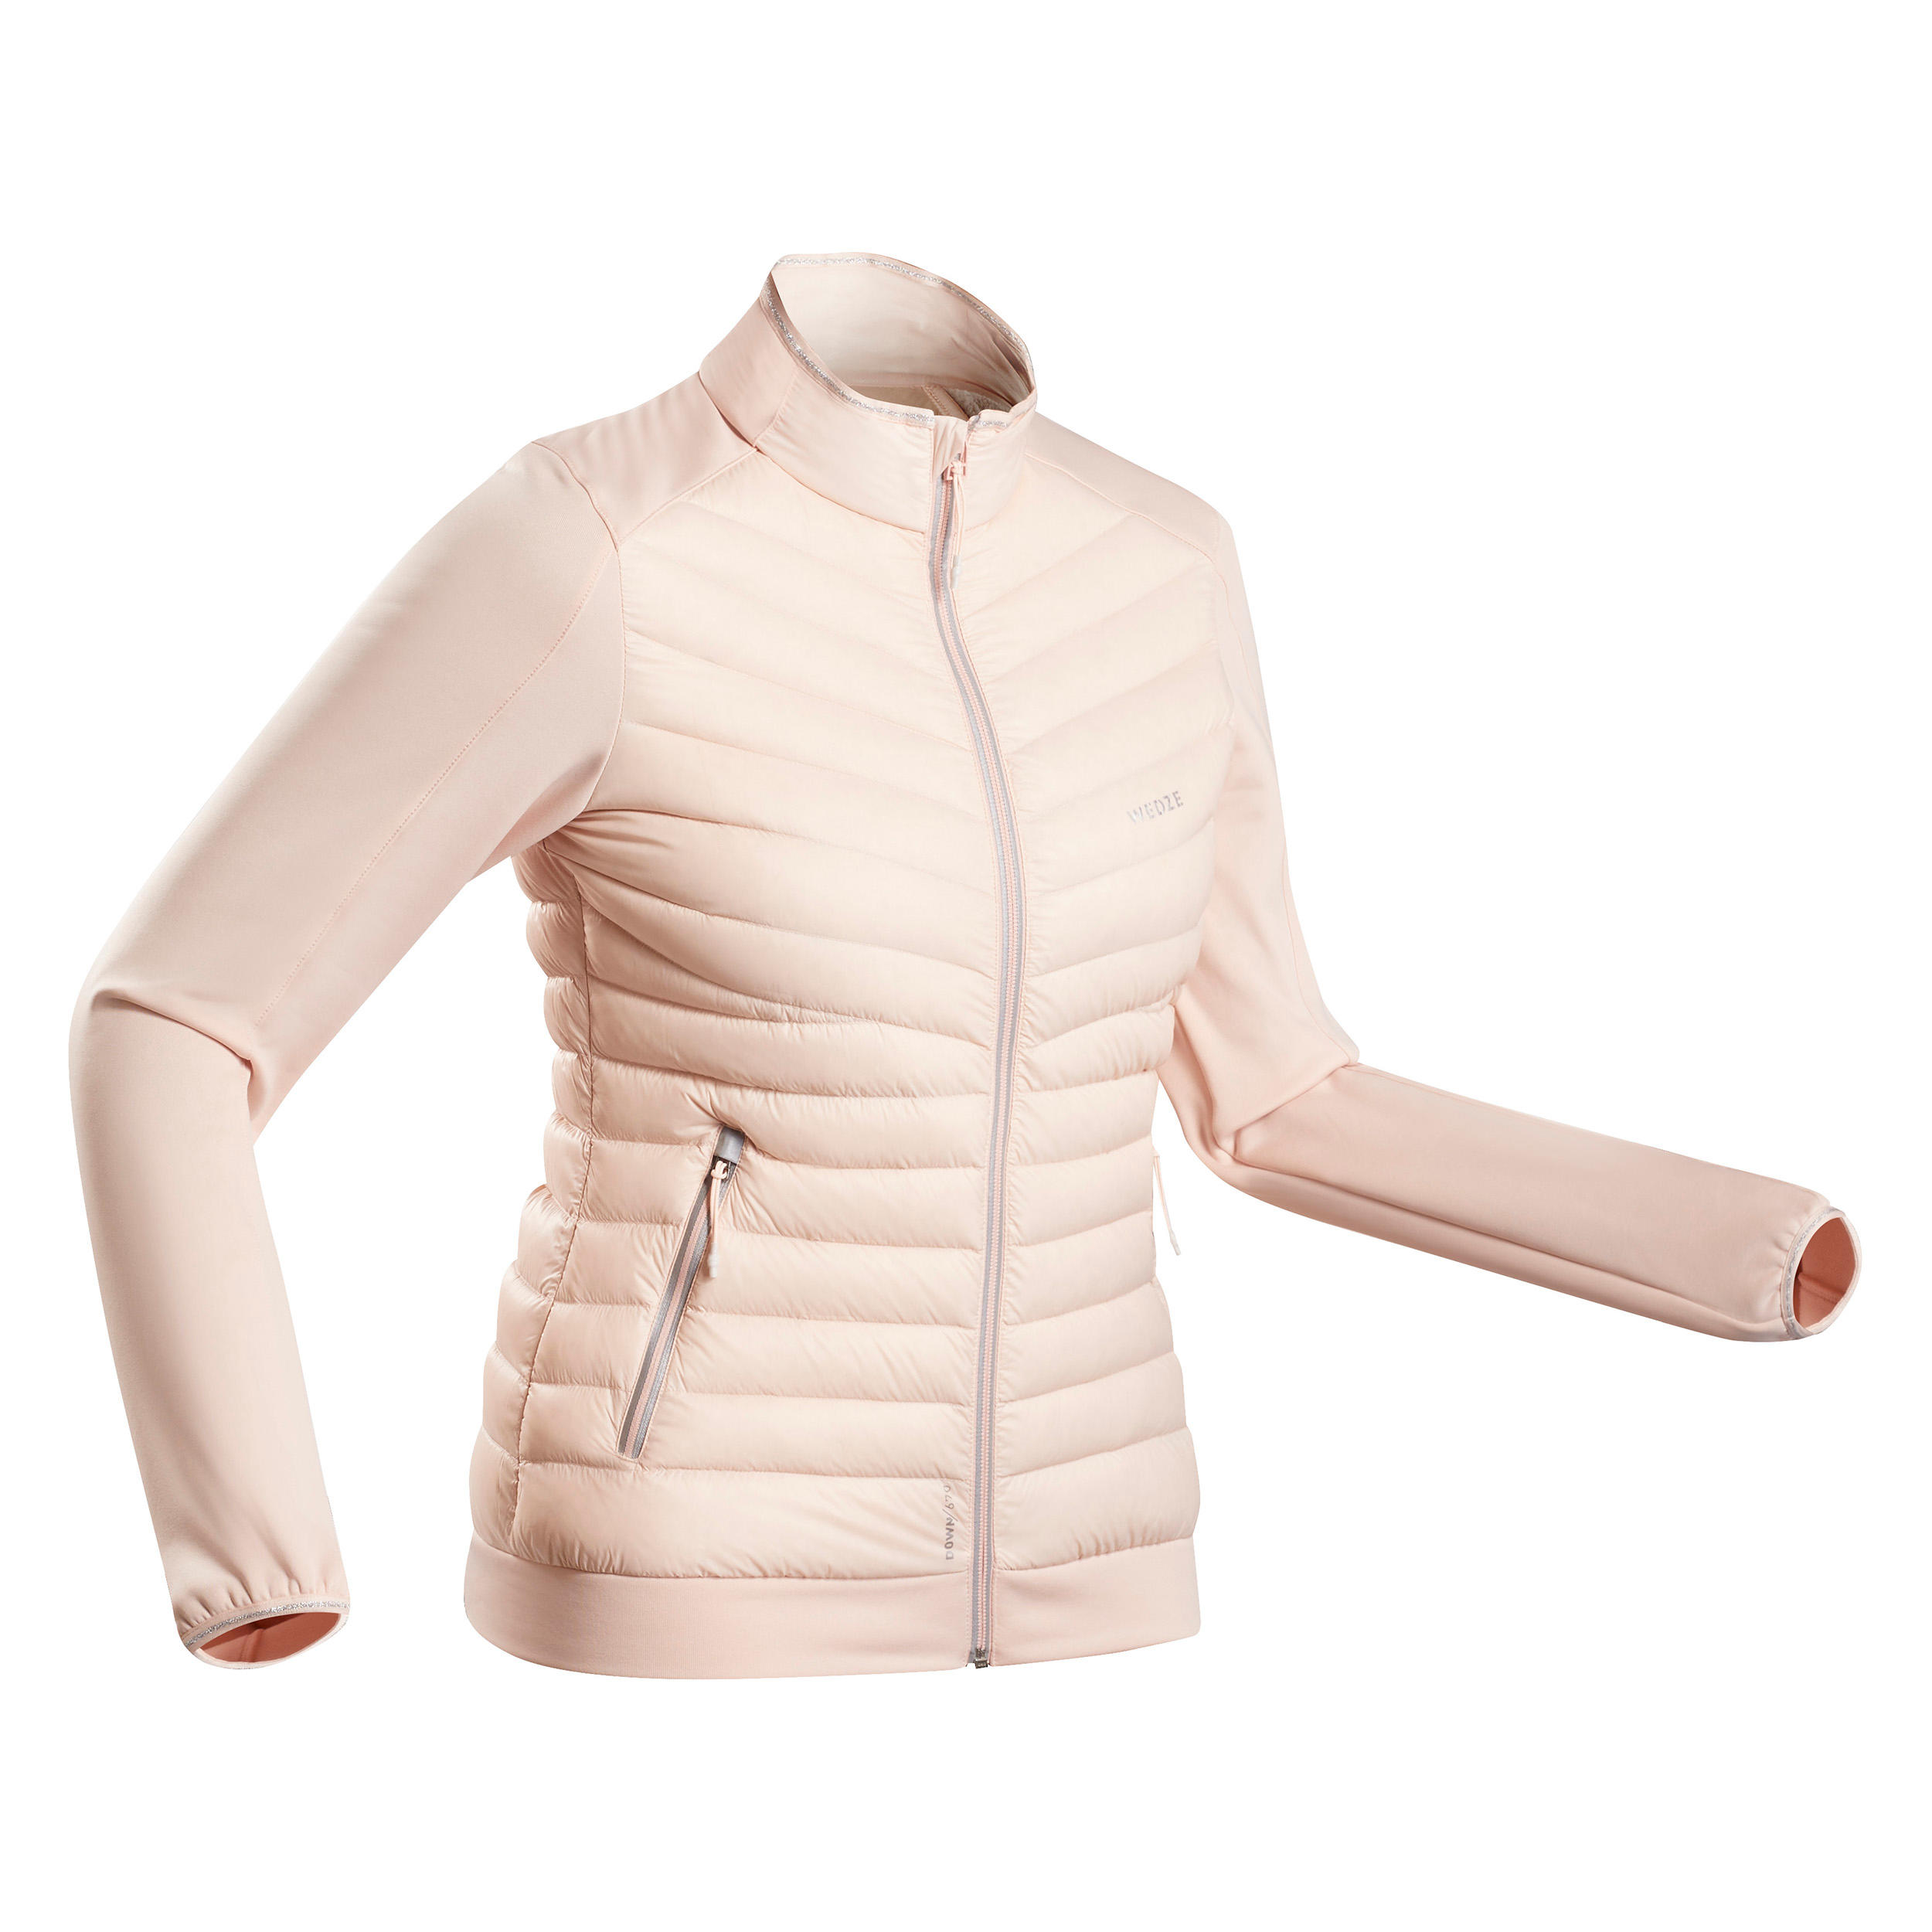 Jachetă schi 900 roz Damă